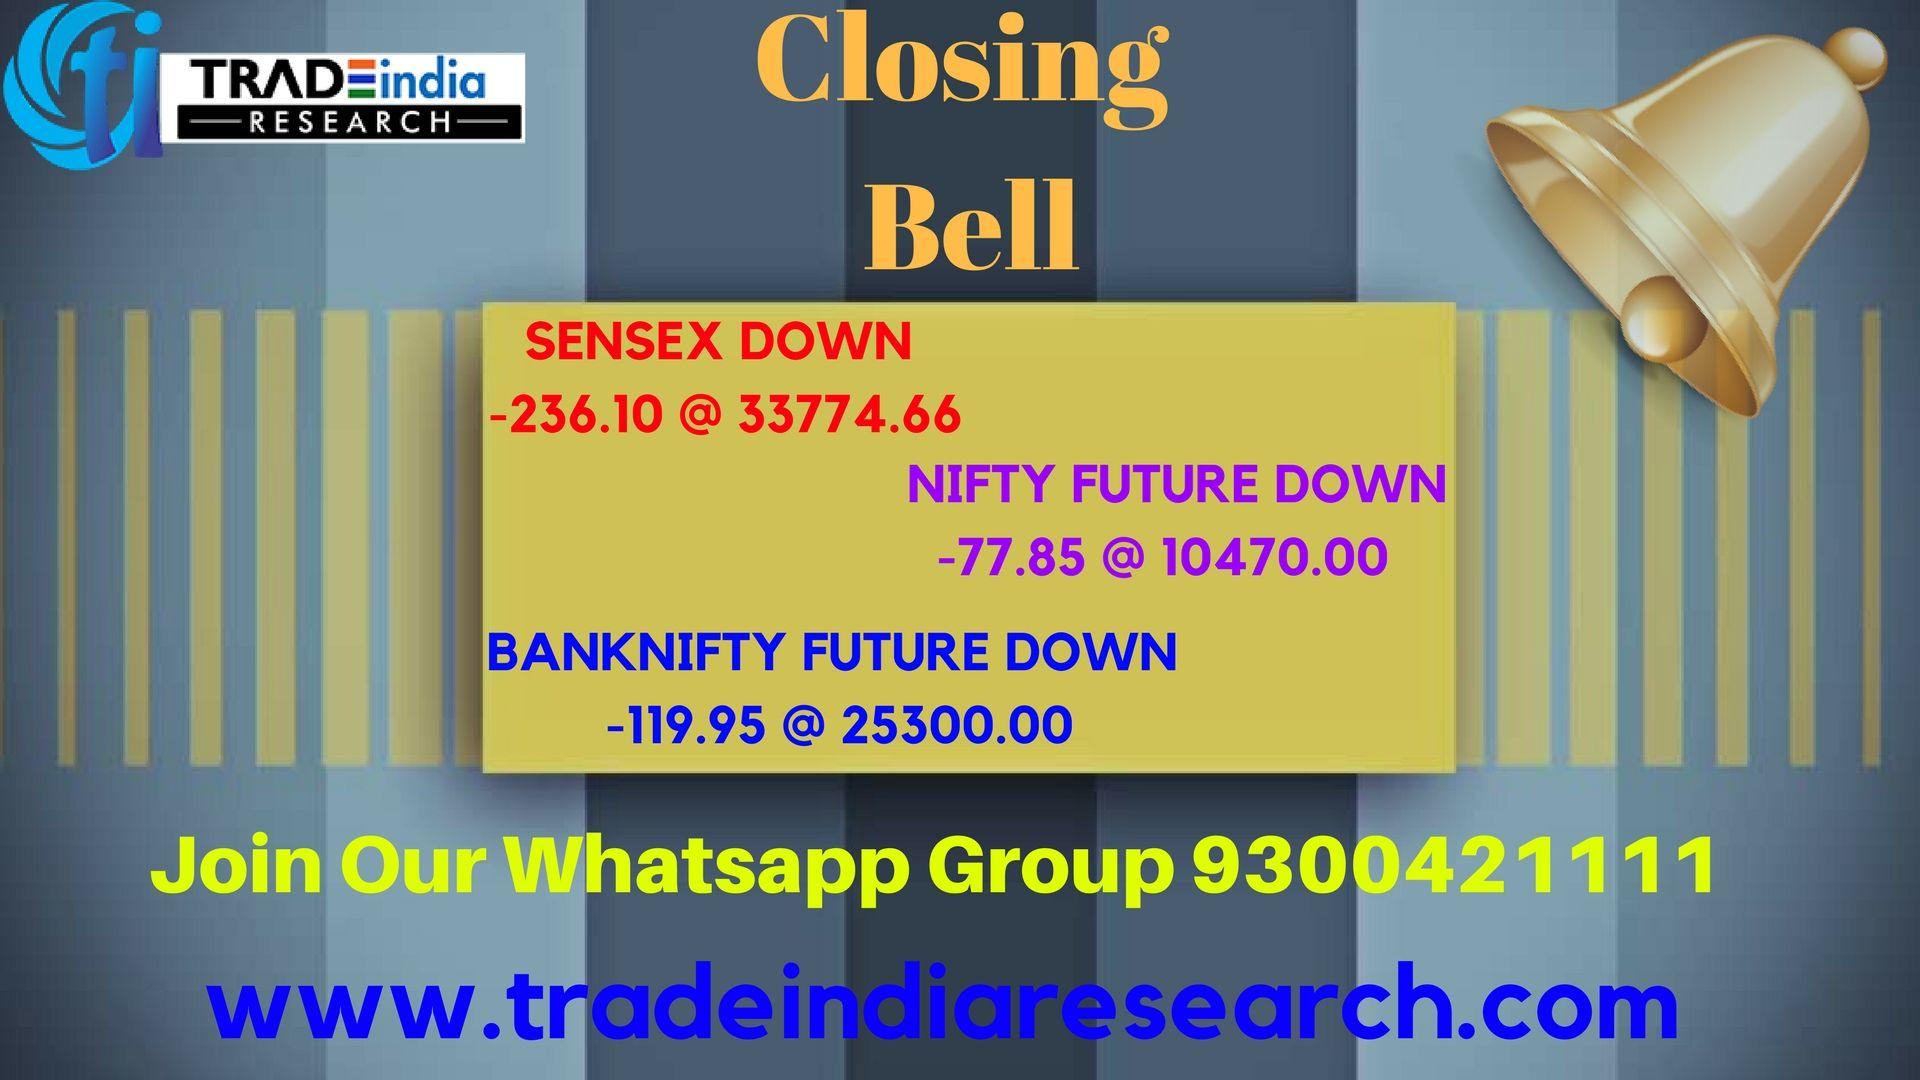 NSE #BSE #Sensex #Nifty #News #India #Stock #Market